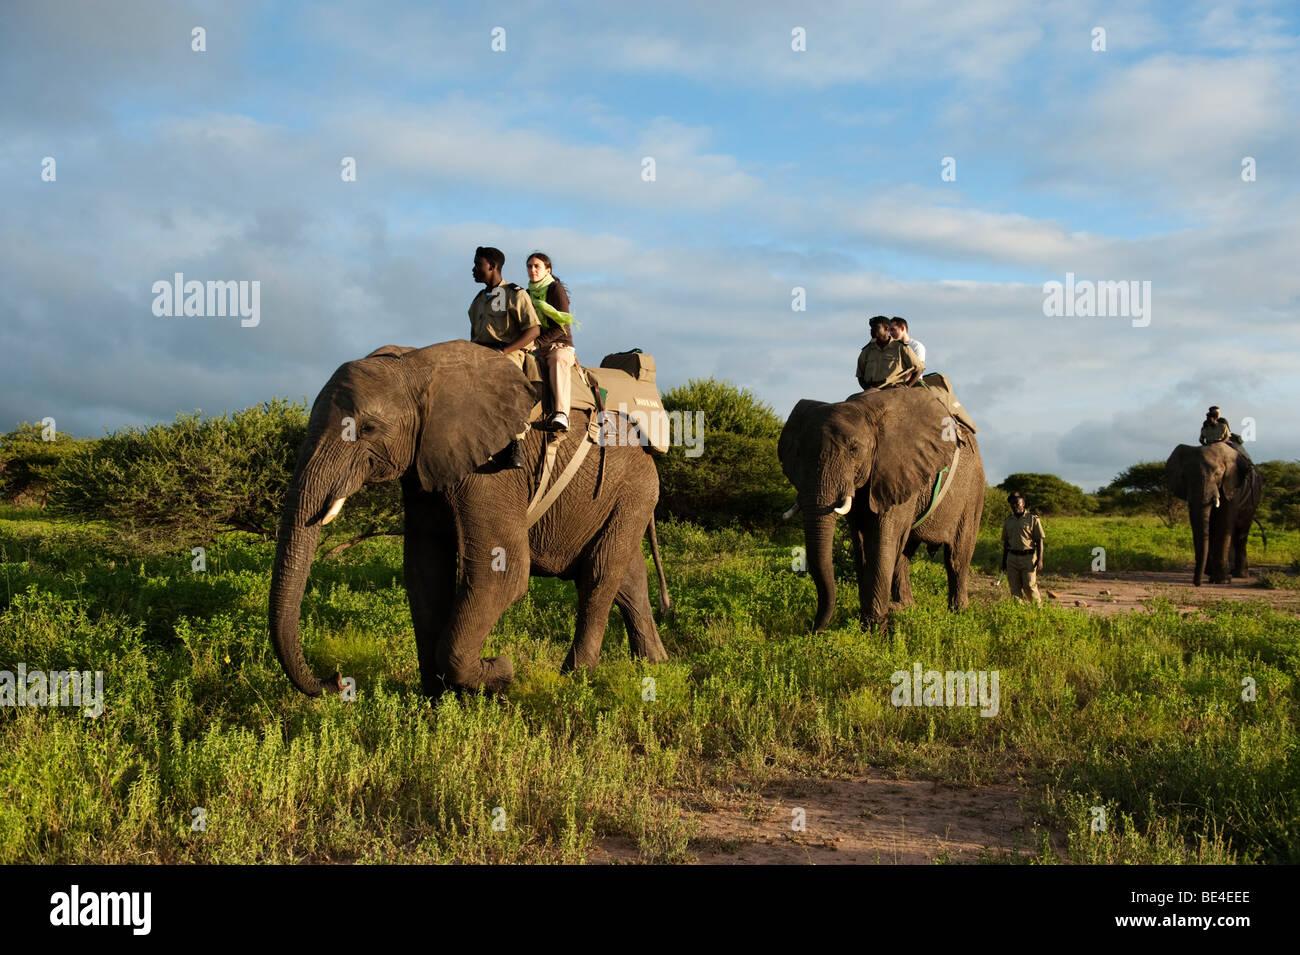 Elephant Back Safari, Kapama Game Reserve, maggiore parco nazionale Kruger, Sud Africa Immagini Stock